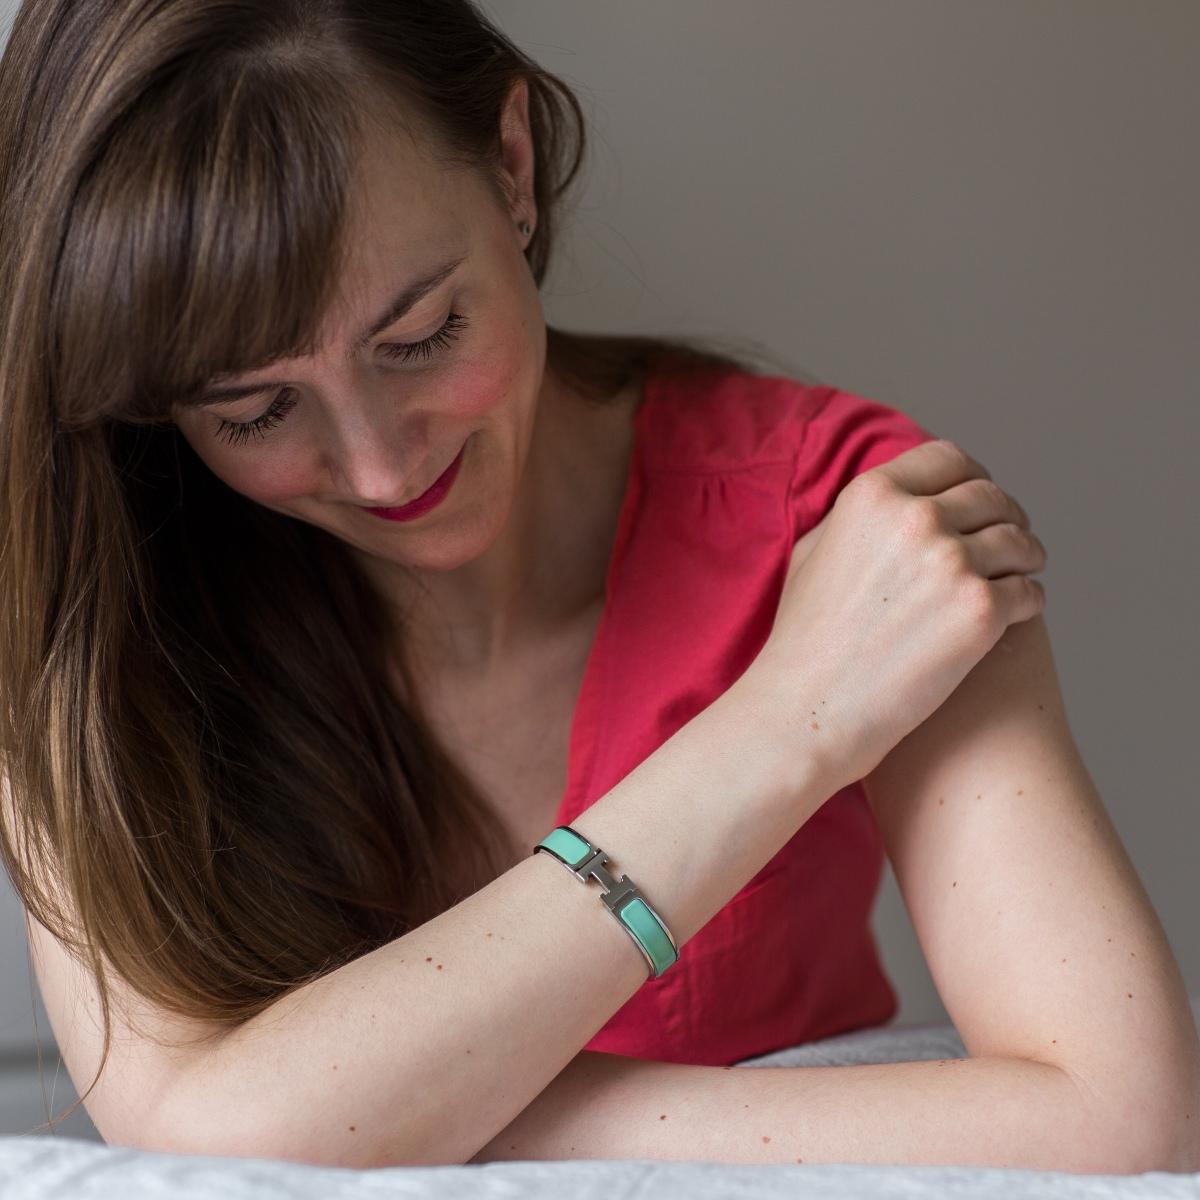 Hermes Clic H, Hermes enamel bracelet, vert aqua, Hermes jewelry, Hermes Clic Clac